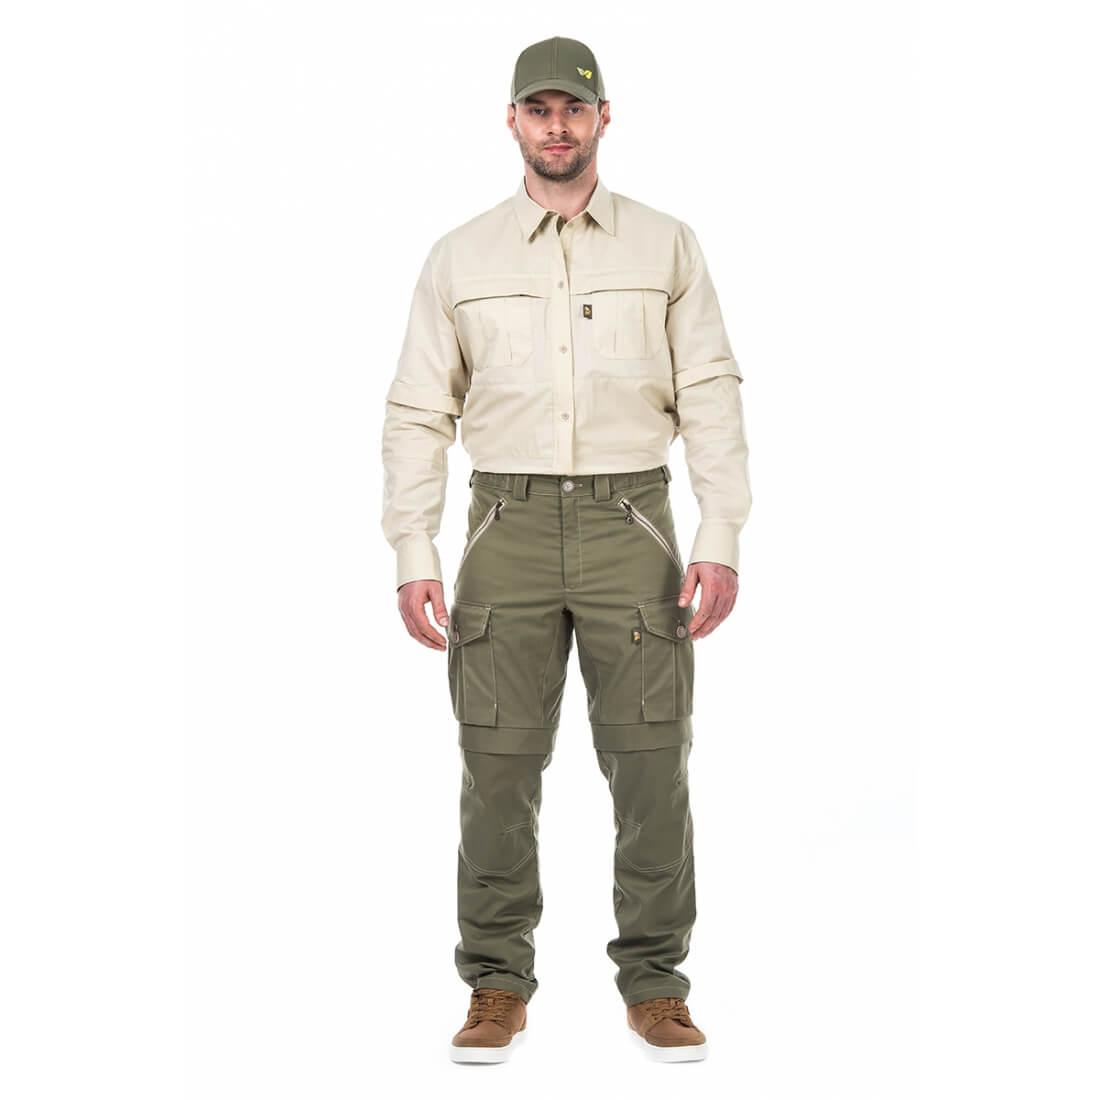 Мужская рубашка Биостоп® Комфорт